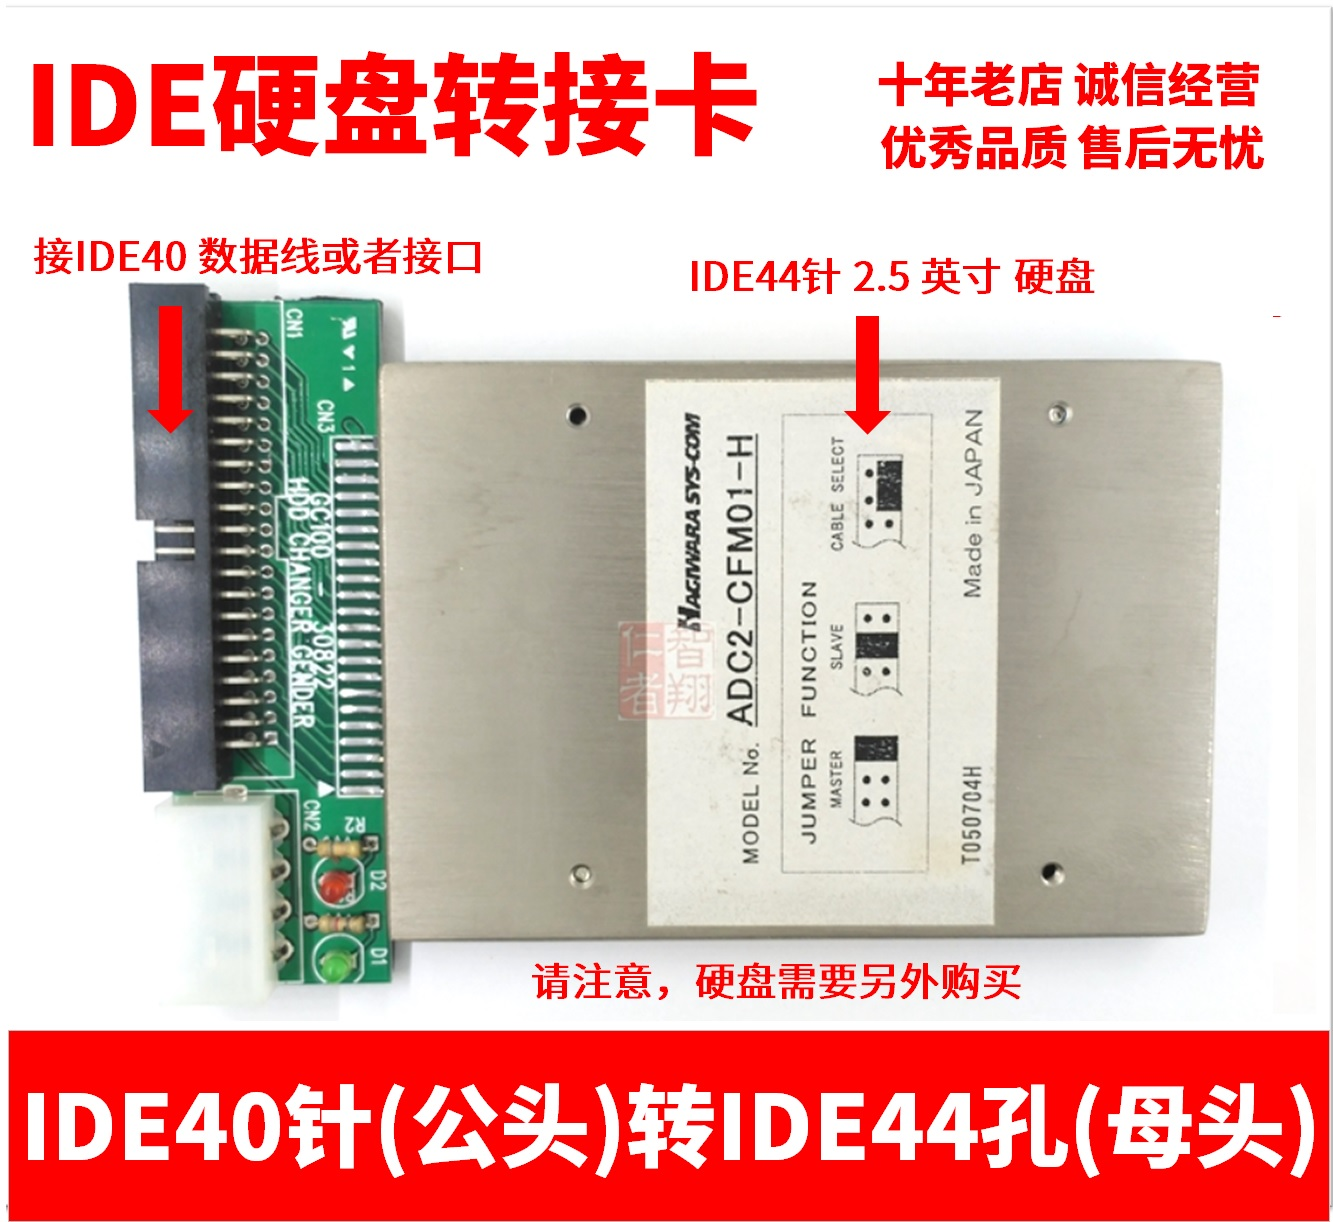 IDE 40针 转 IDE44 孔 3.5寸IDE公头转 2.5 寸 IDE 母头转接卡